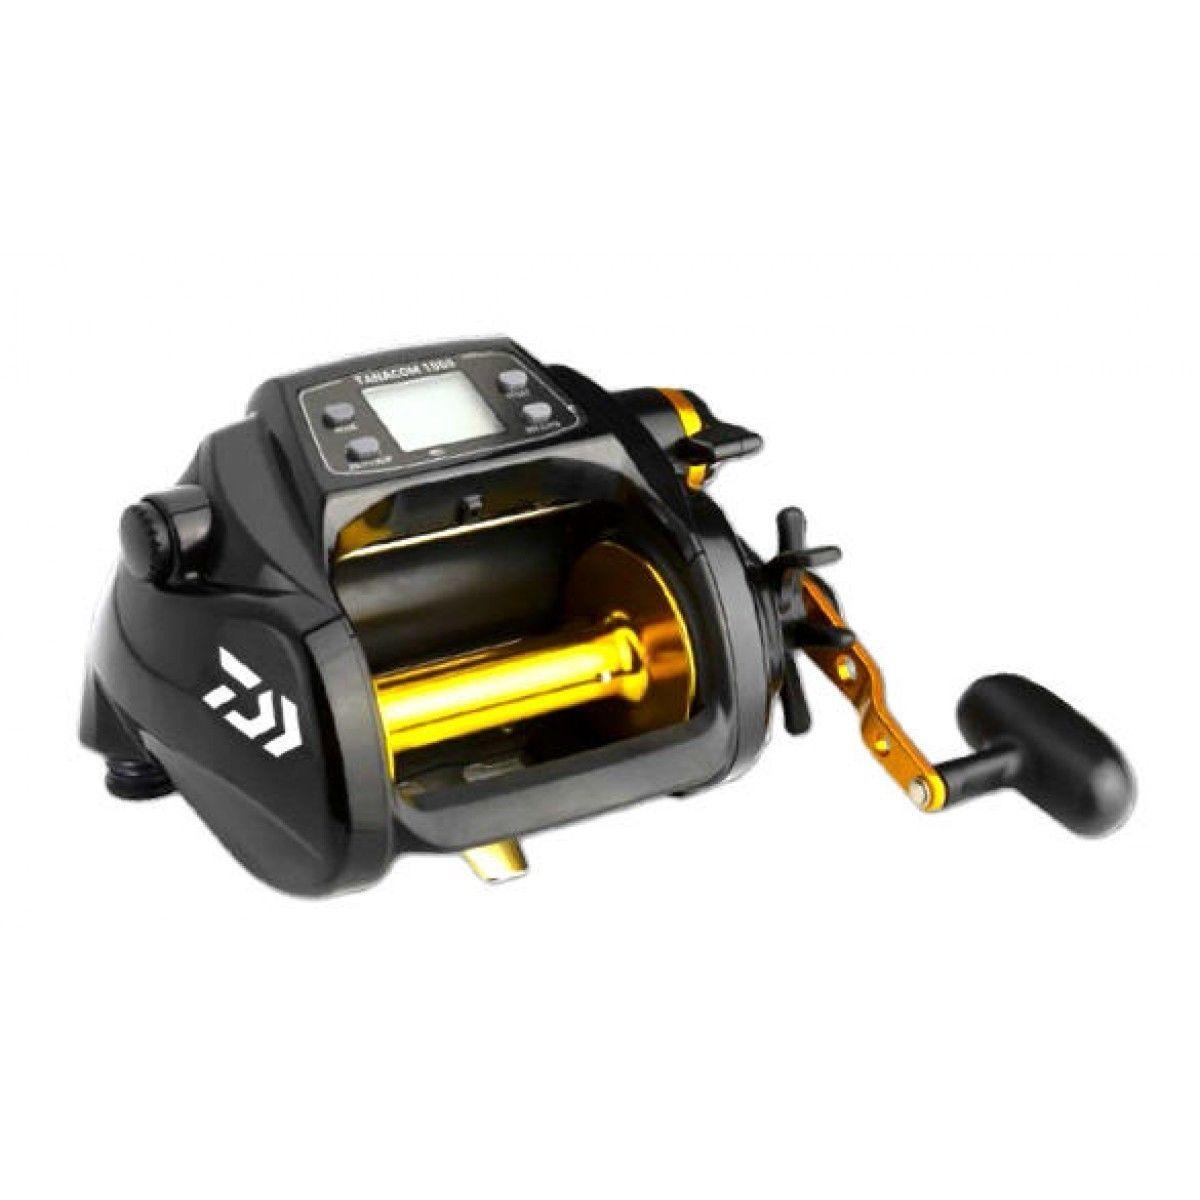 Details about Daiwa 1000 Big Game Electric Fishing